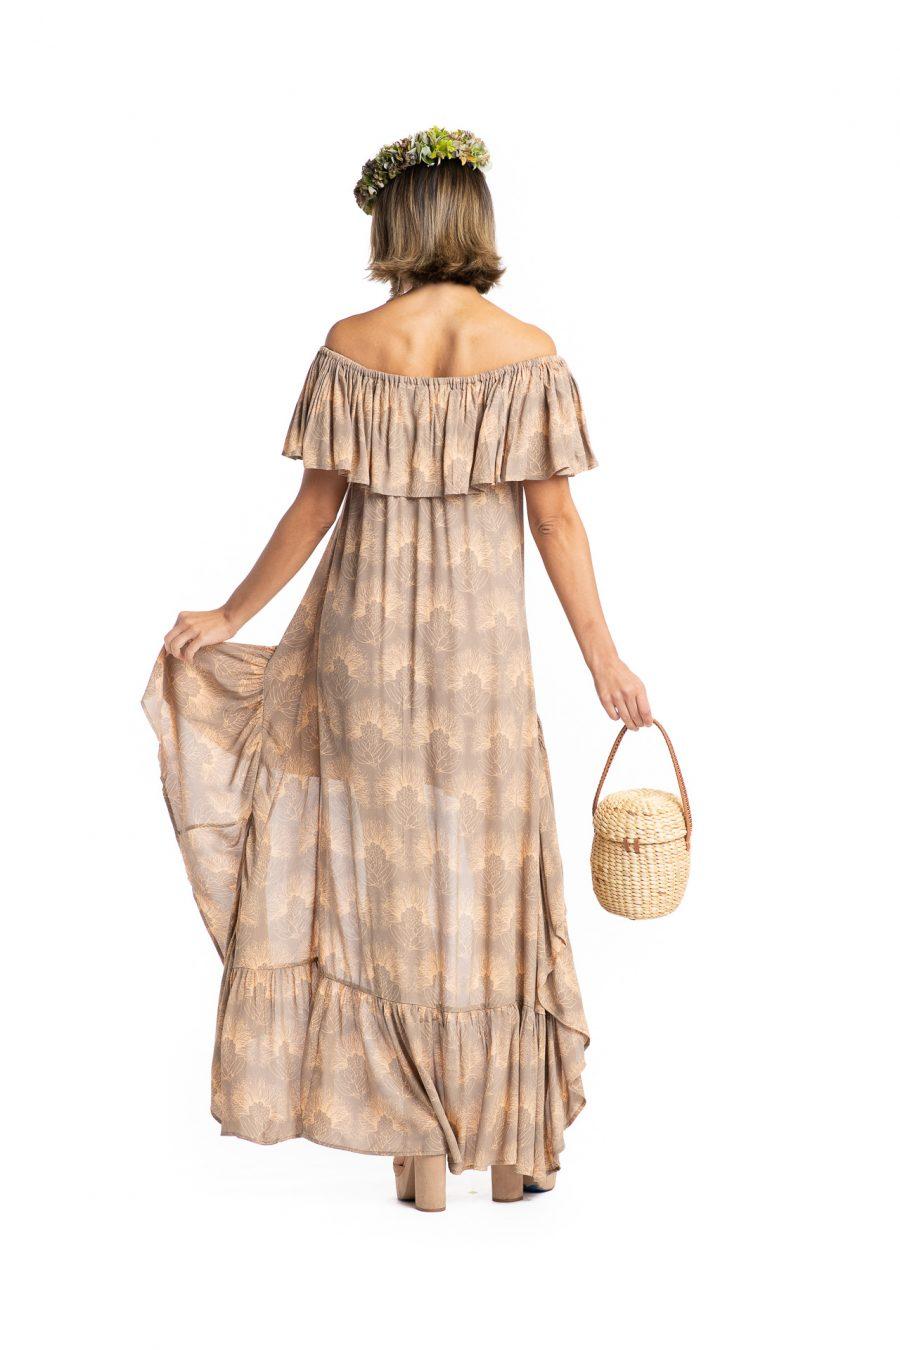 Model wearing Hauoli Long Dress in Kalihilehua Pattern - Back View